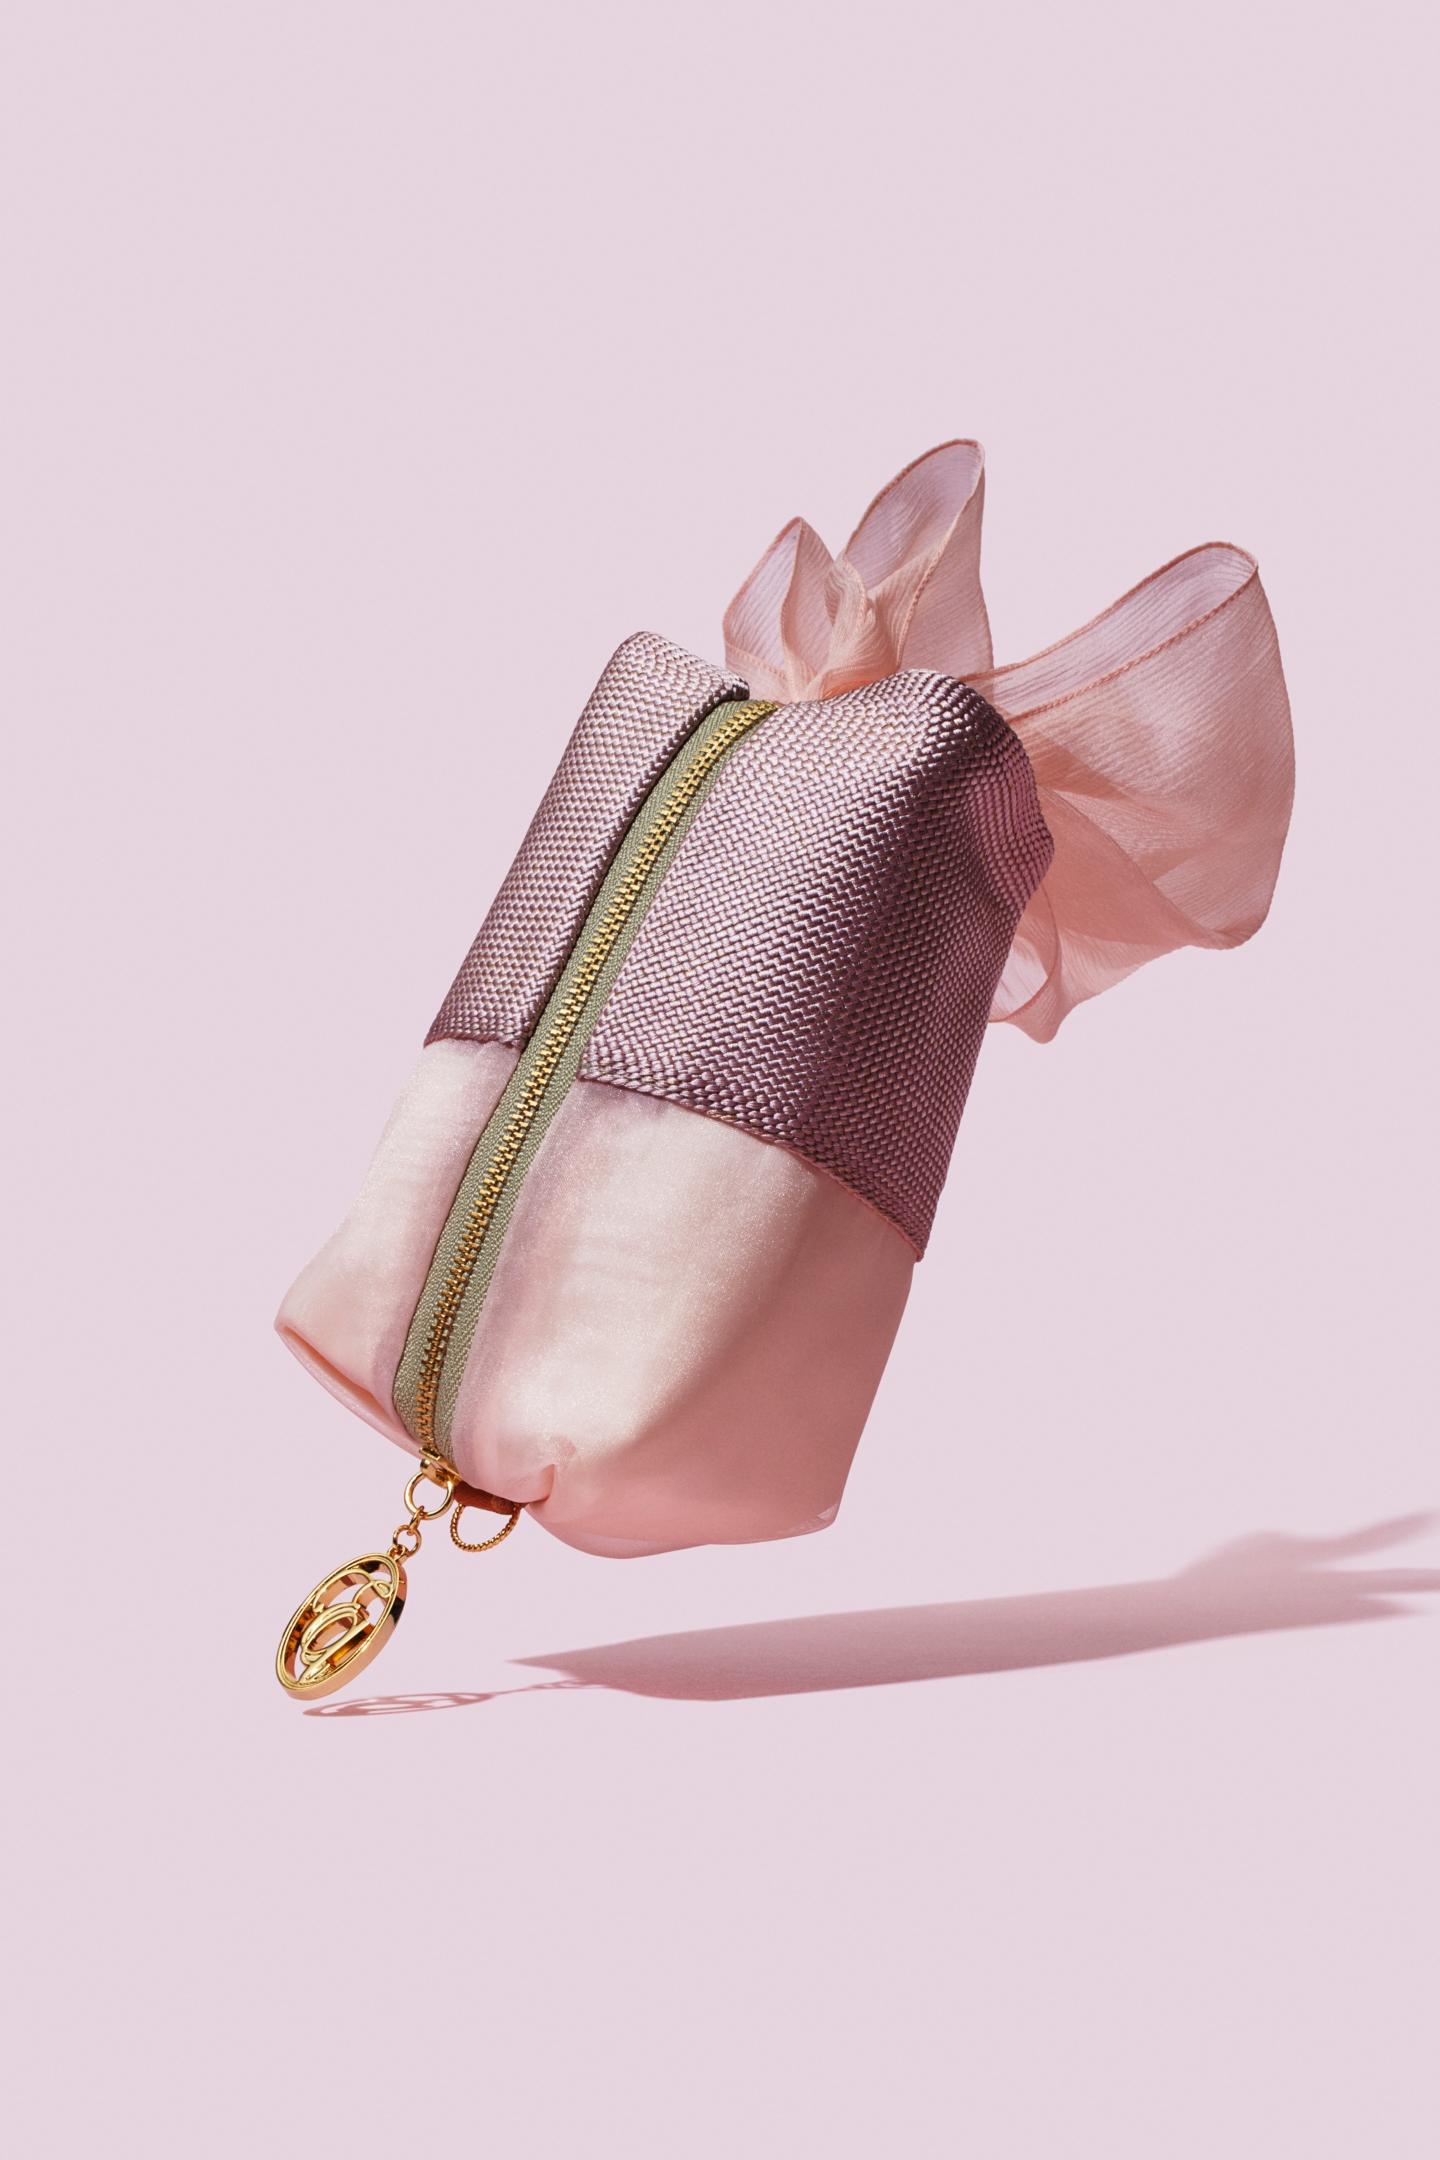 【Ryukobo】Umbrellas you will want to use on sunny days